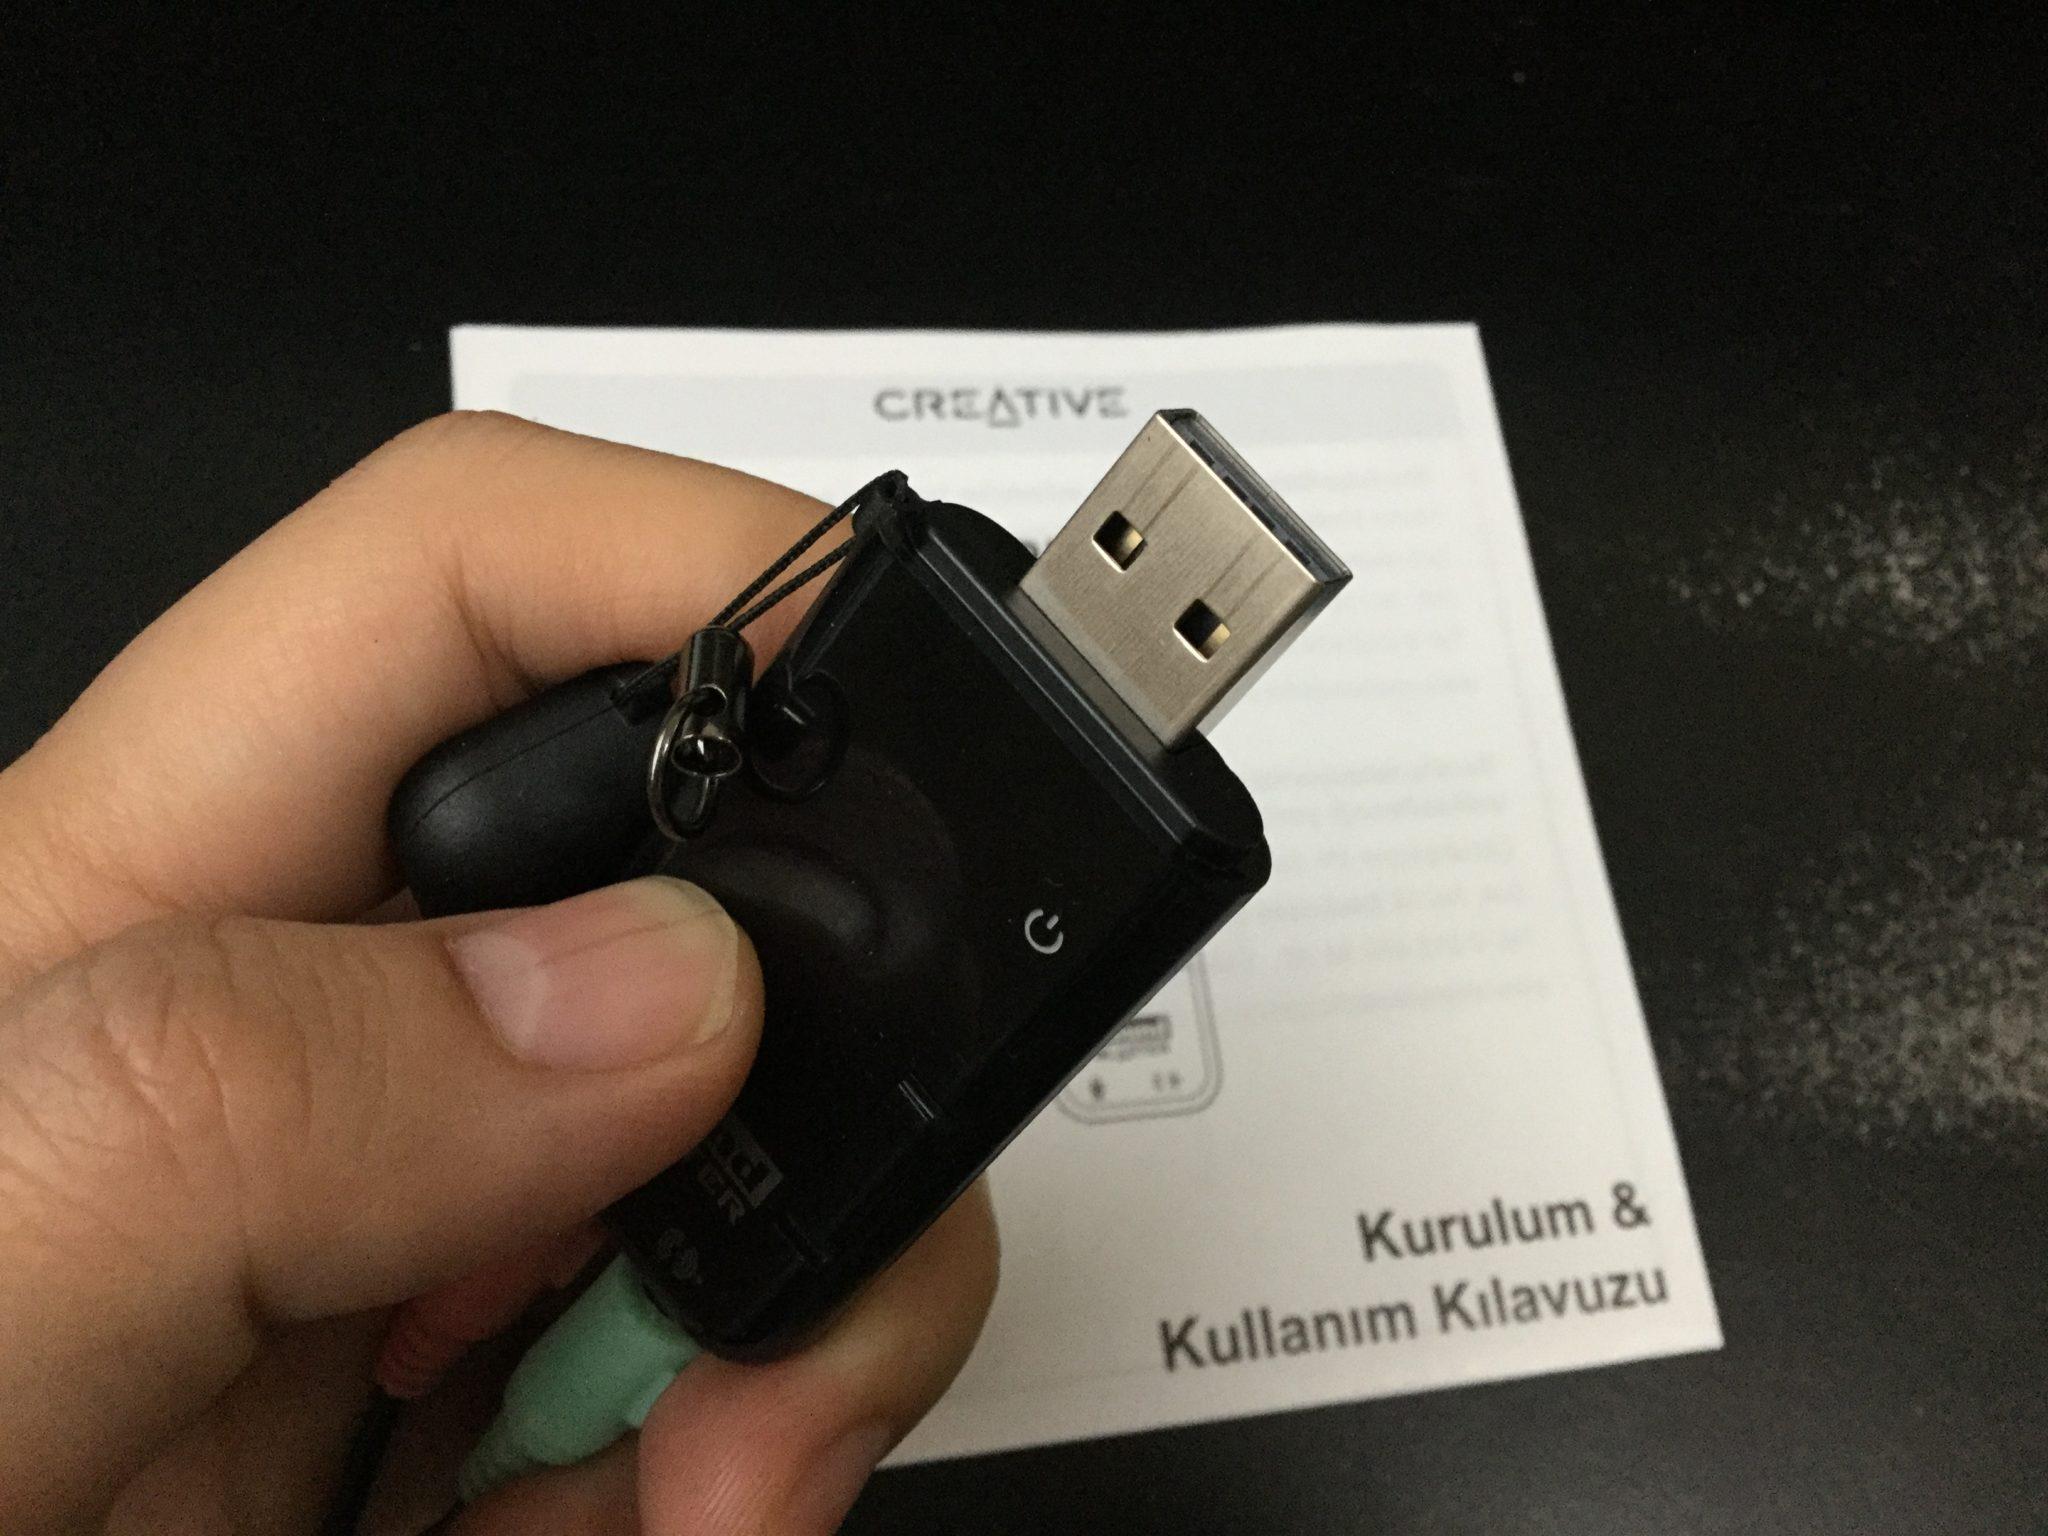 Sound Blaster X-Fi Go! Pro r2 Creative SB-XFI-GPR2 USB端子